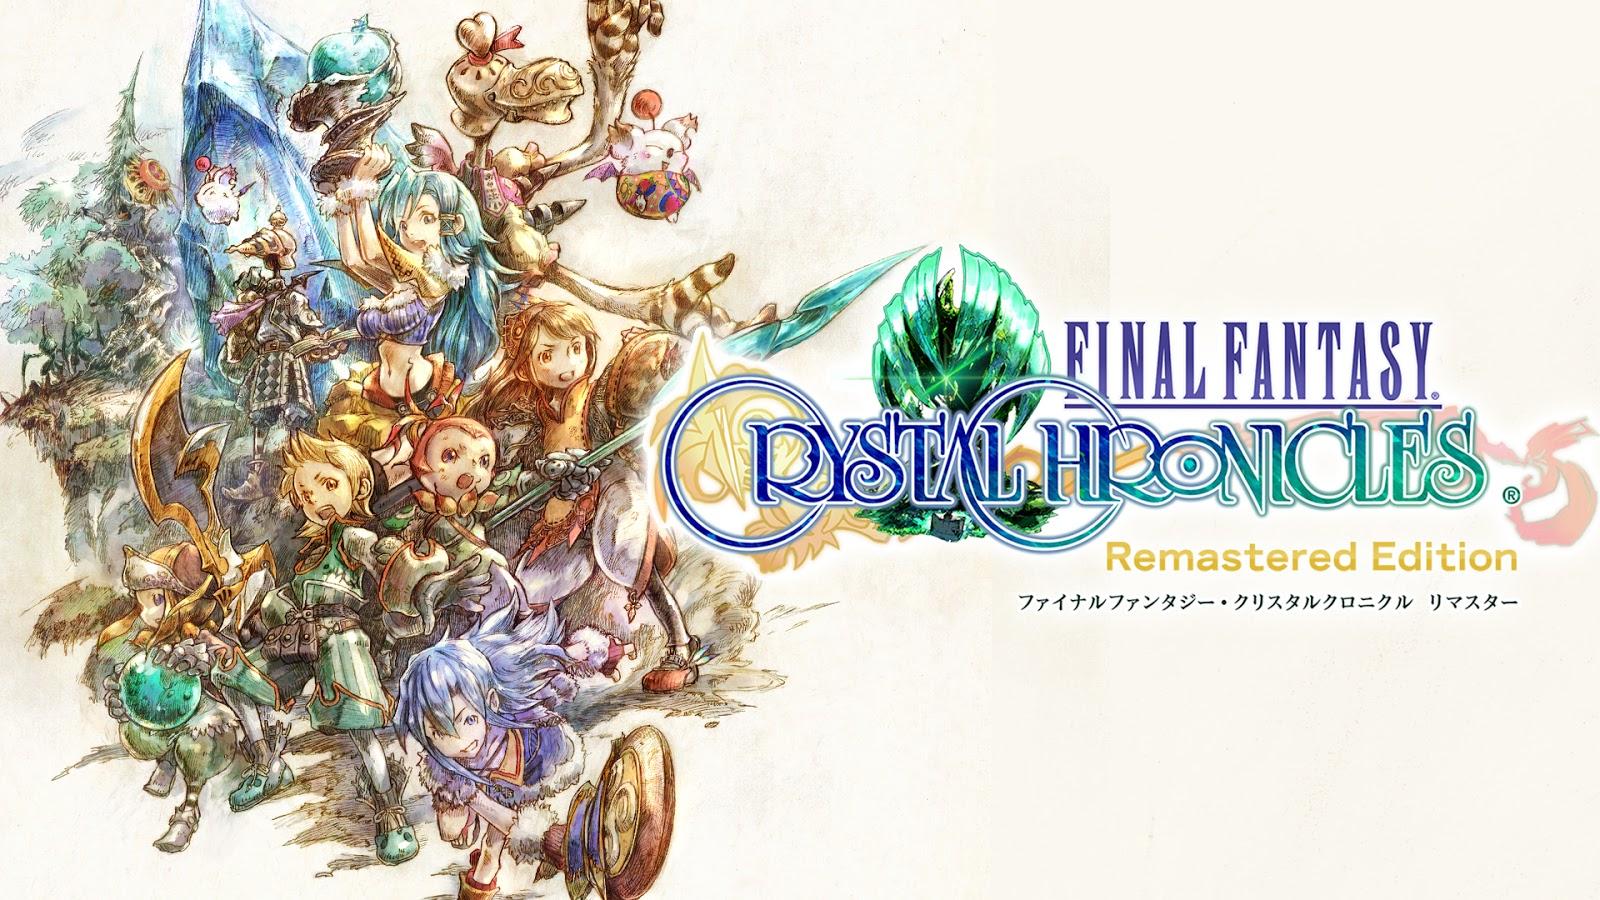 [Review] Final Fantasy Crystal Chronicles Remastered Edition para PS4 4